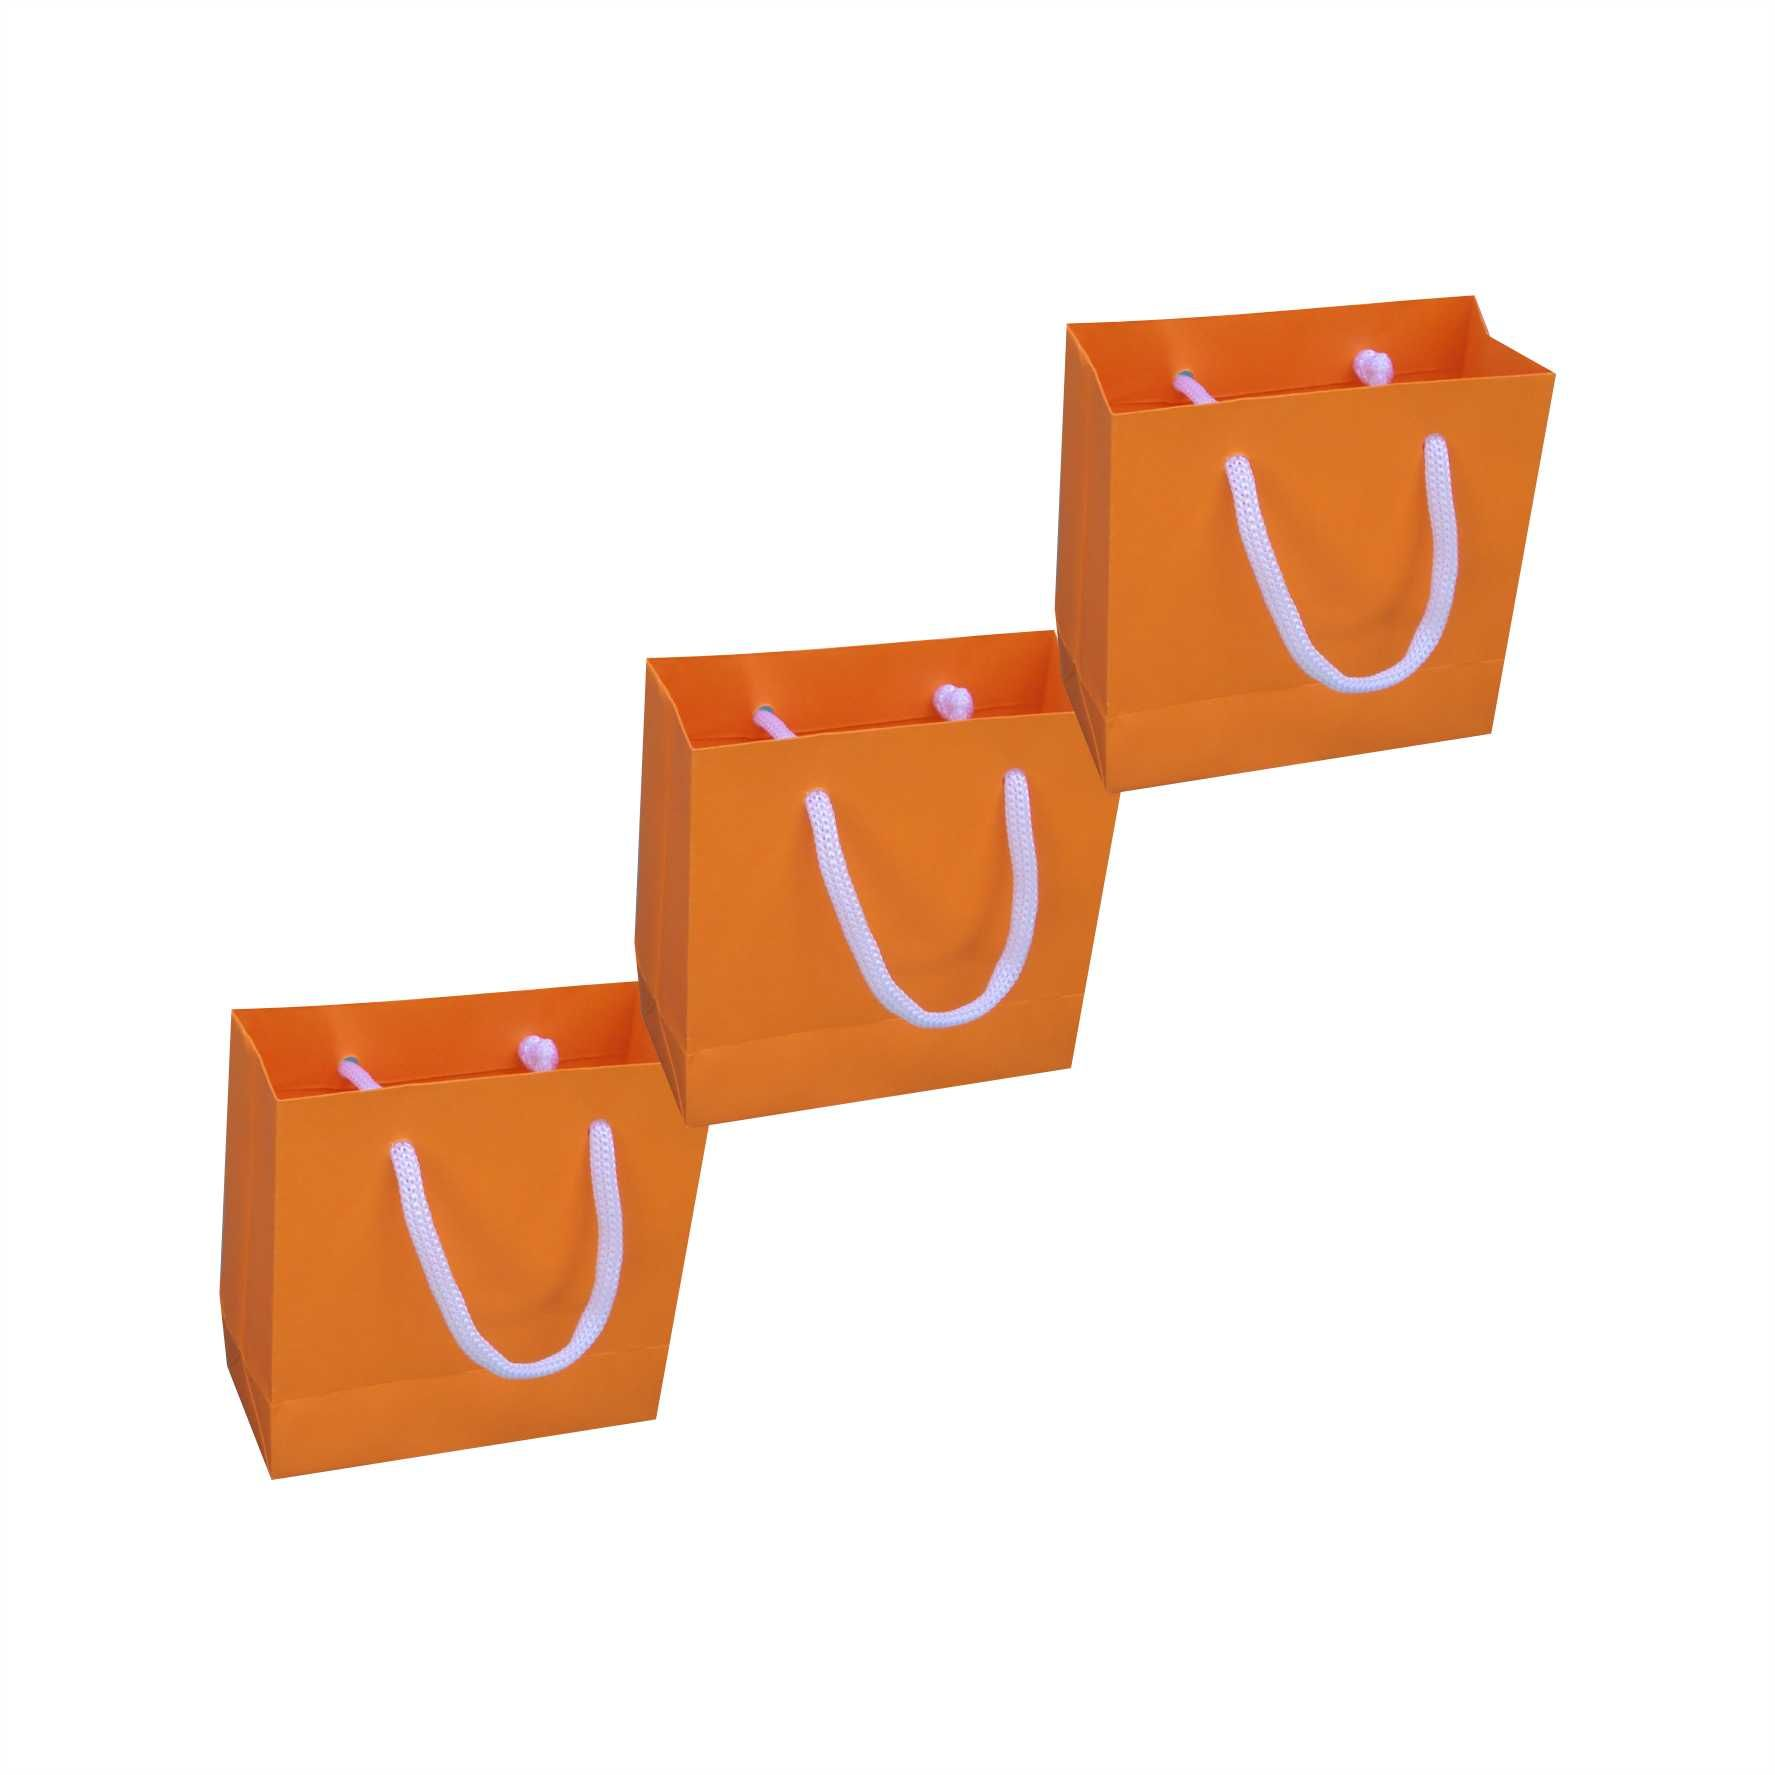 Sacola de papel mini (10x10x4,5 cm) laranja - 10 unidades